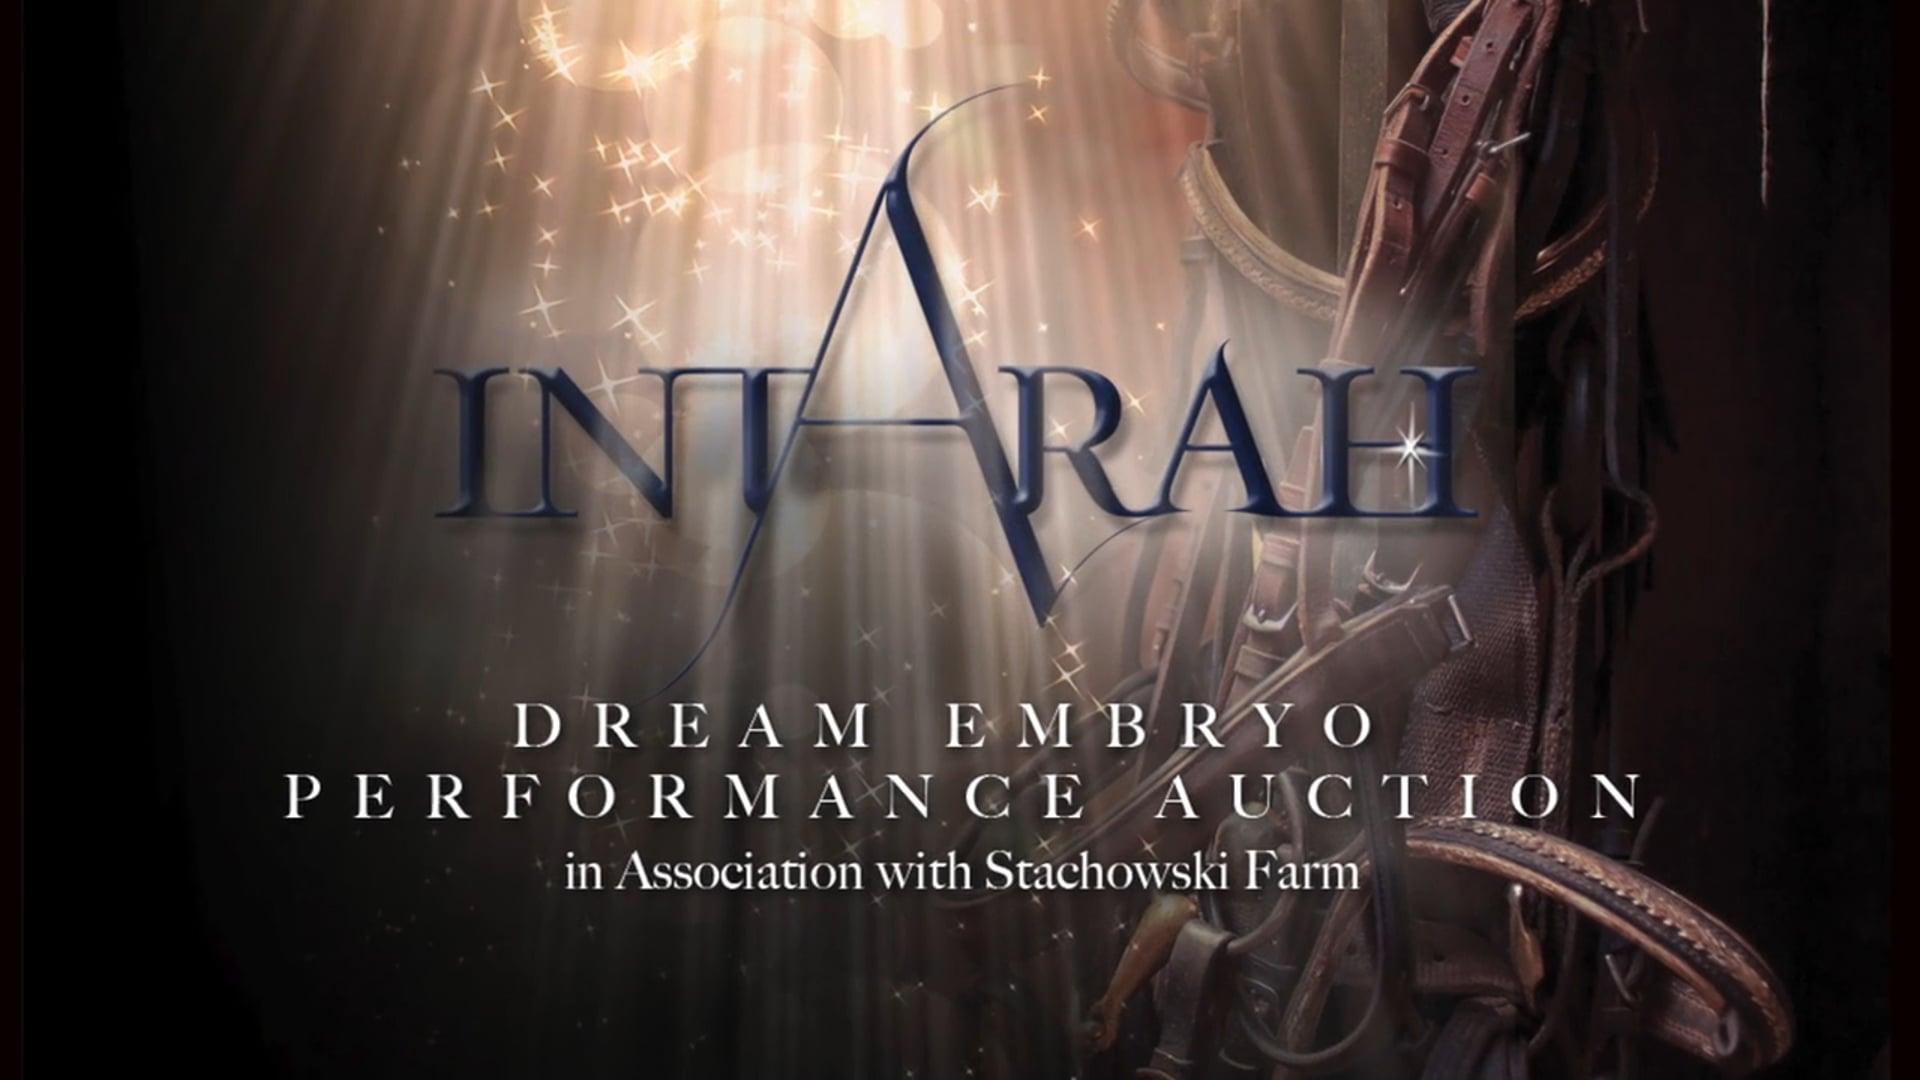 2016 IntArah Dream Embryo Performance Auction